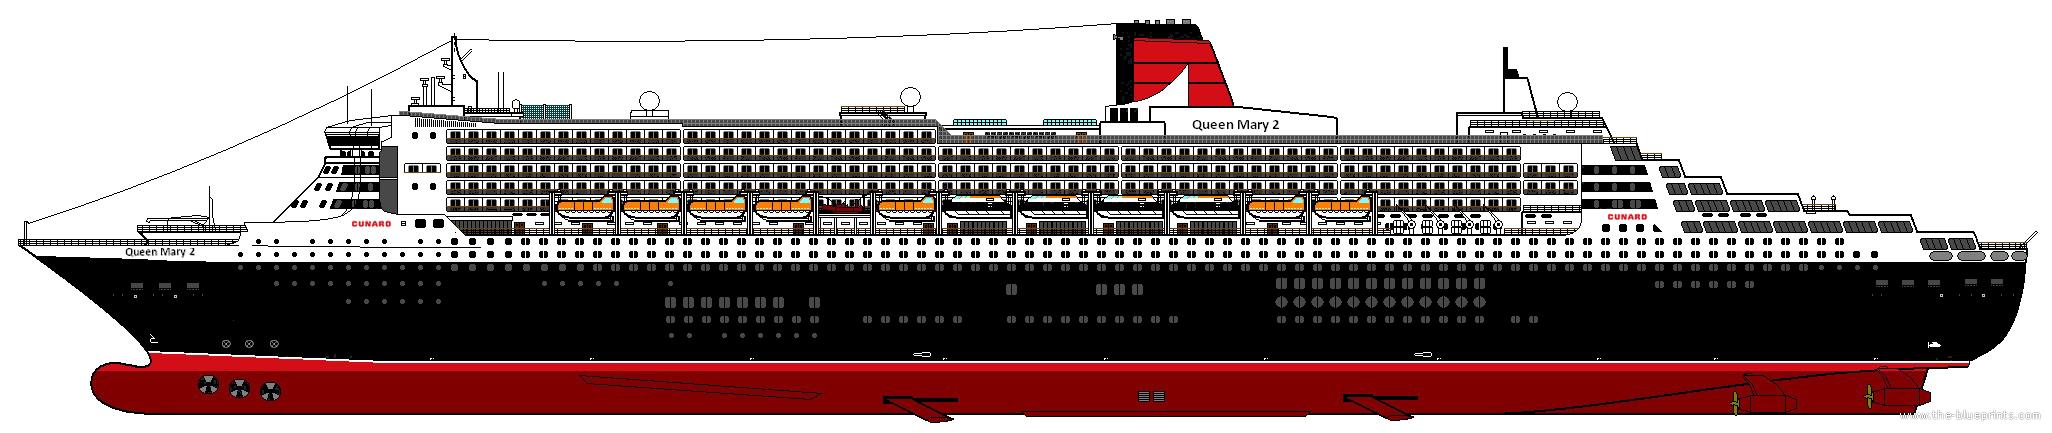 TheBlueprintscom Blueprints Ships Ships UK RMS Queen - Cruise ship drawings